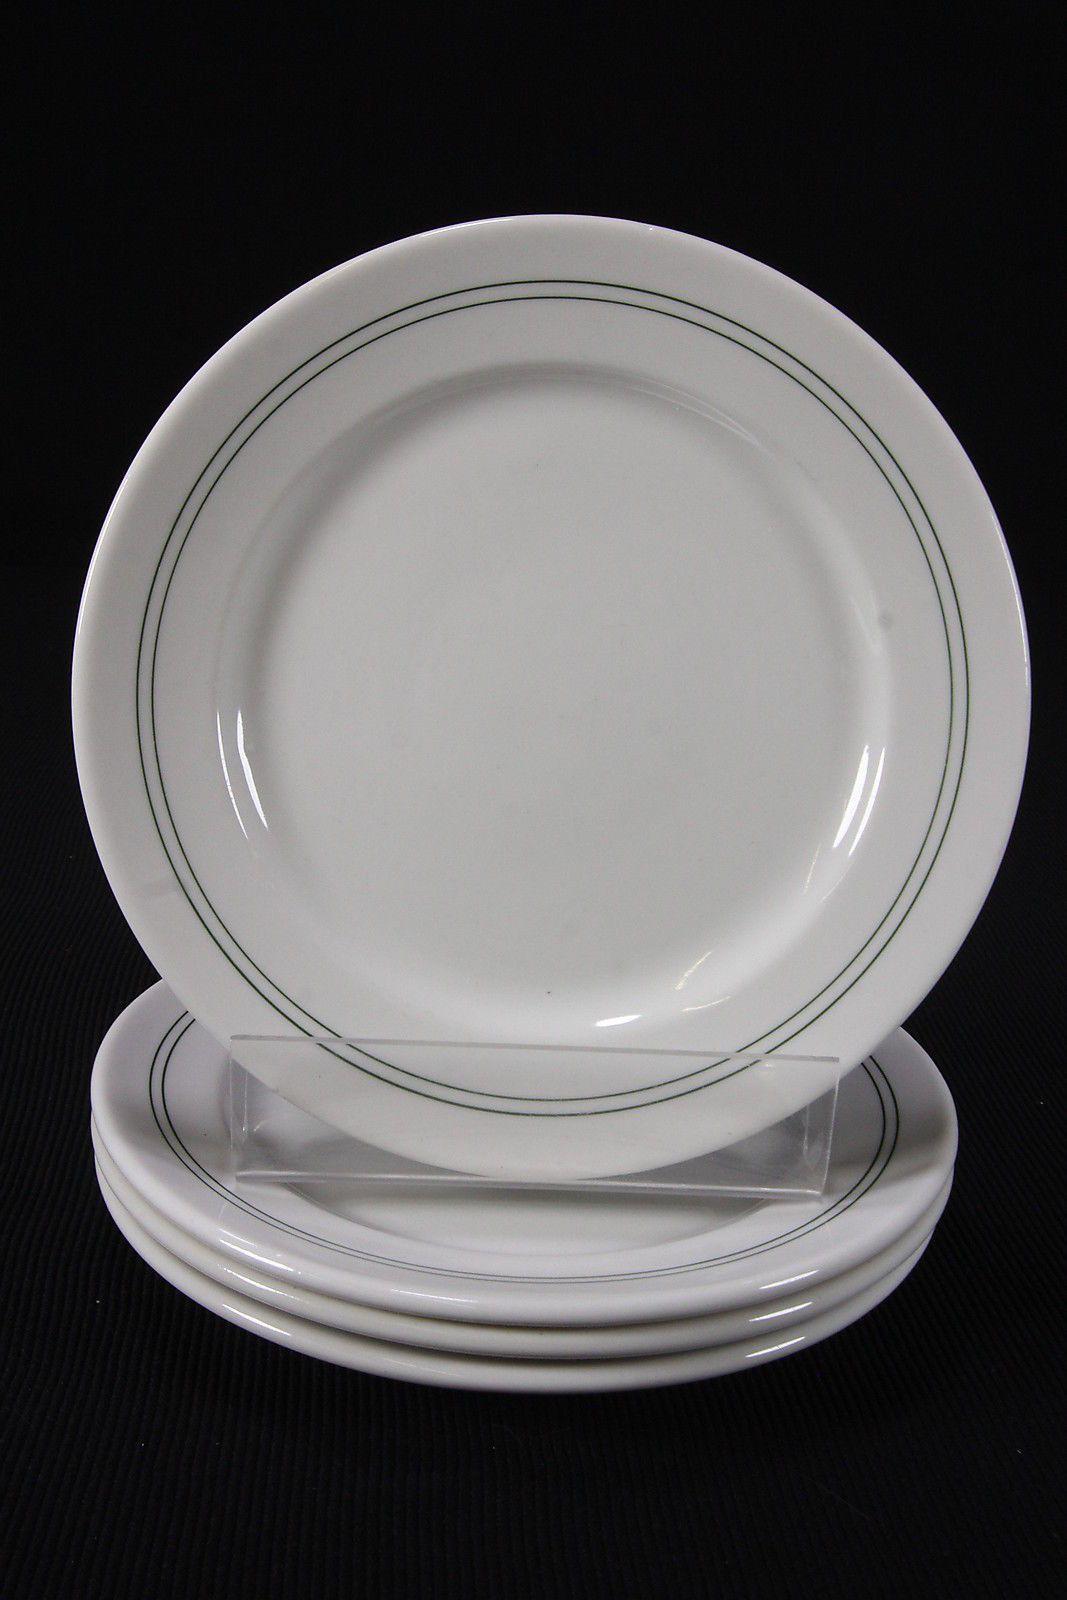 4 Syracuse China Vtg Plates 8 7/8  Dbl Green Bands On White Restaurant & 4 Syracuse China Vtg Plates 8 7/8